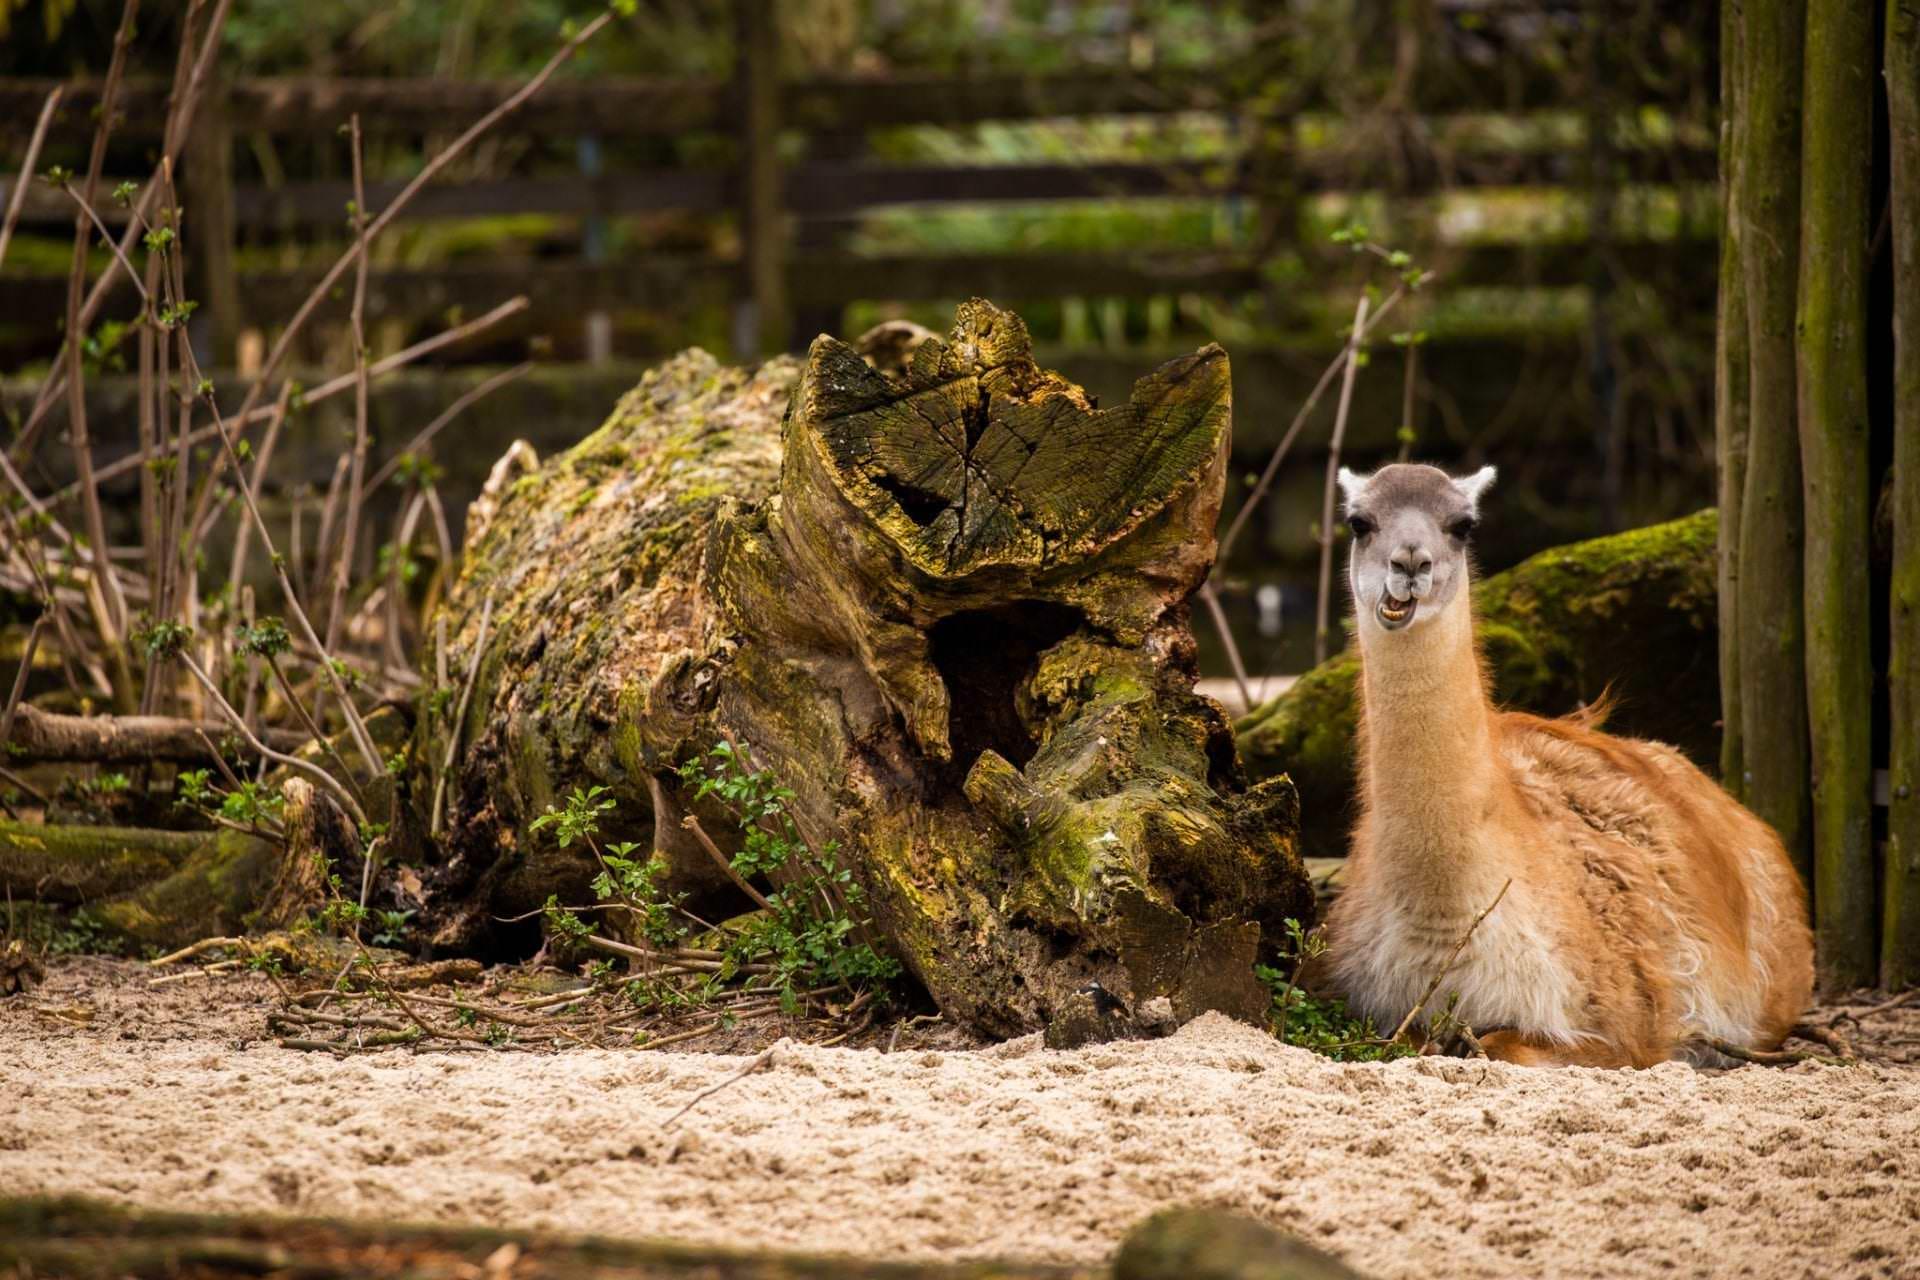 02.03.2020 Besuch im Krefelder Zoo